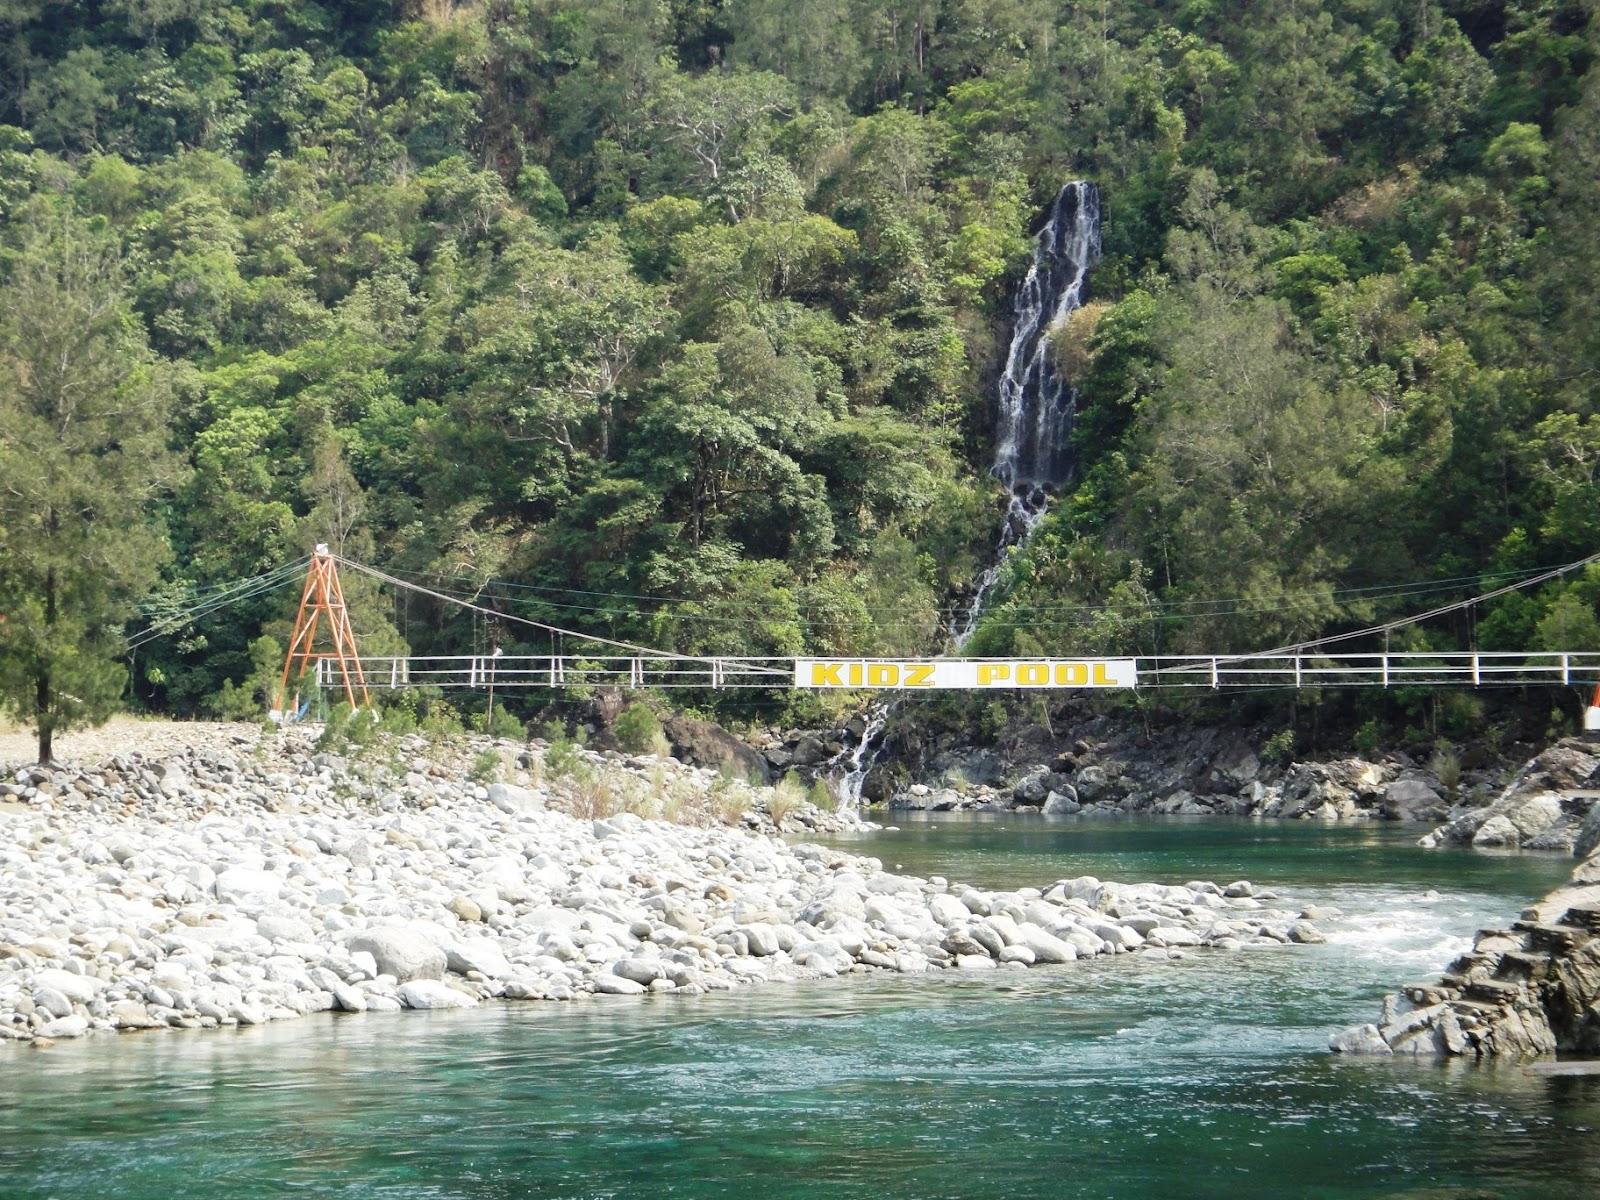 Limbonis Kidz Pool Mountain Resort Coto Mines Masinloc Zambales